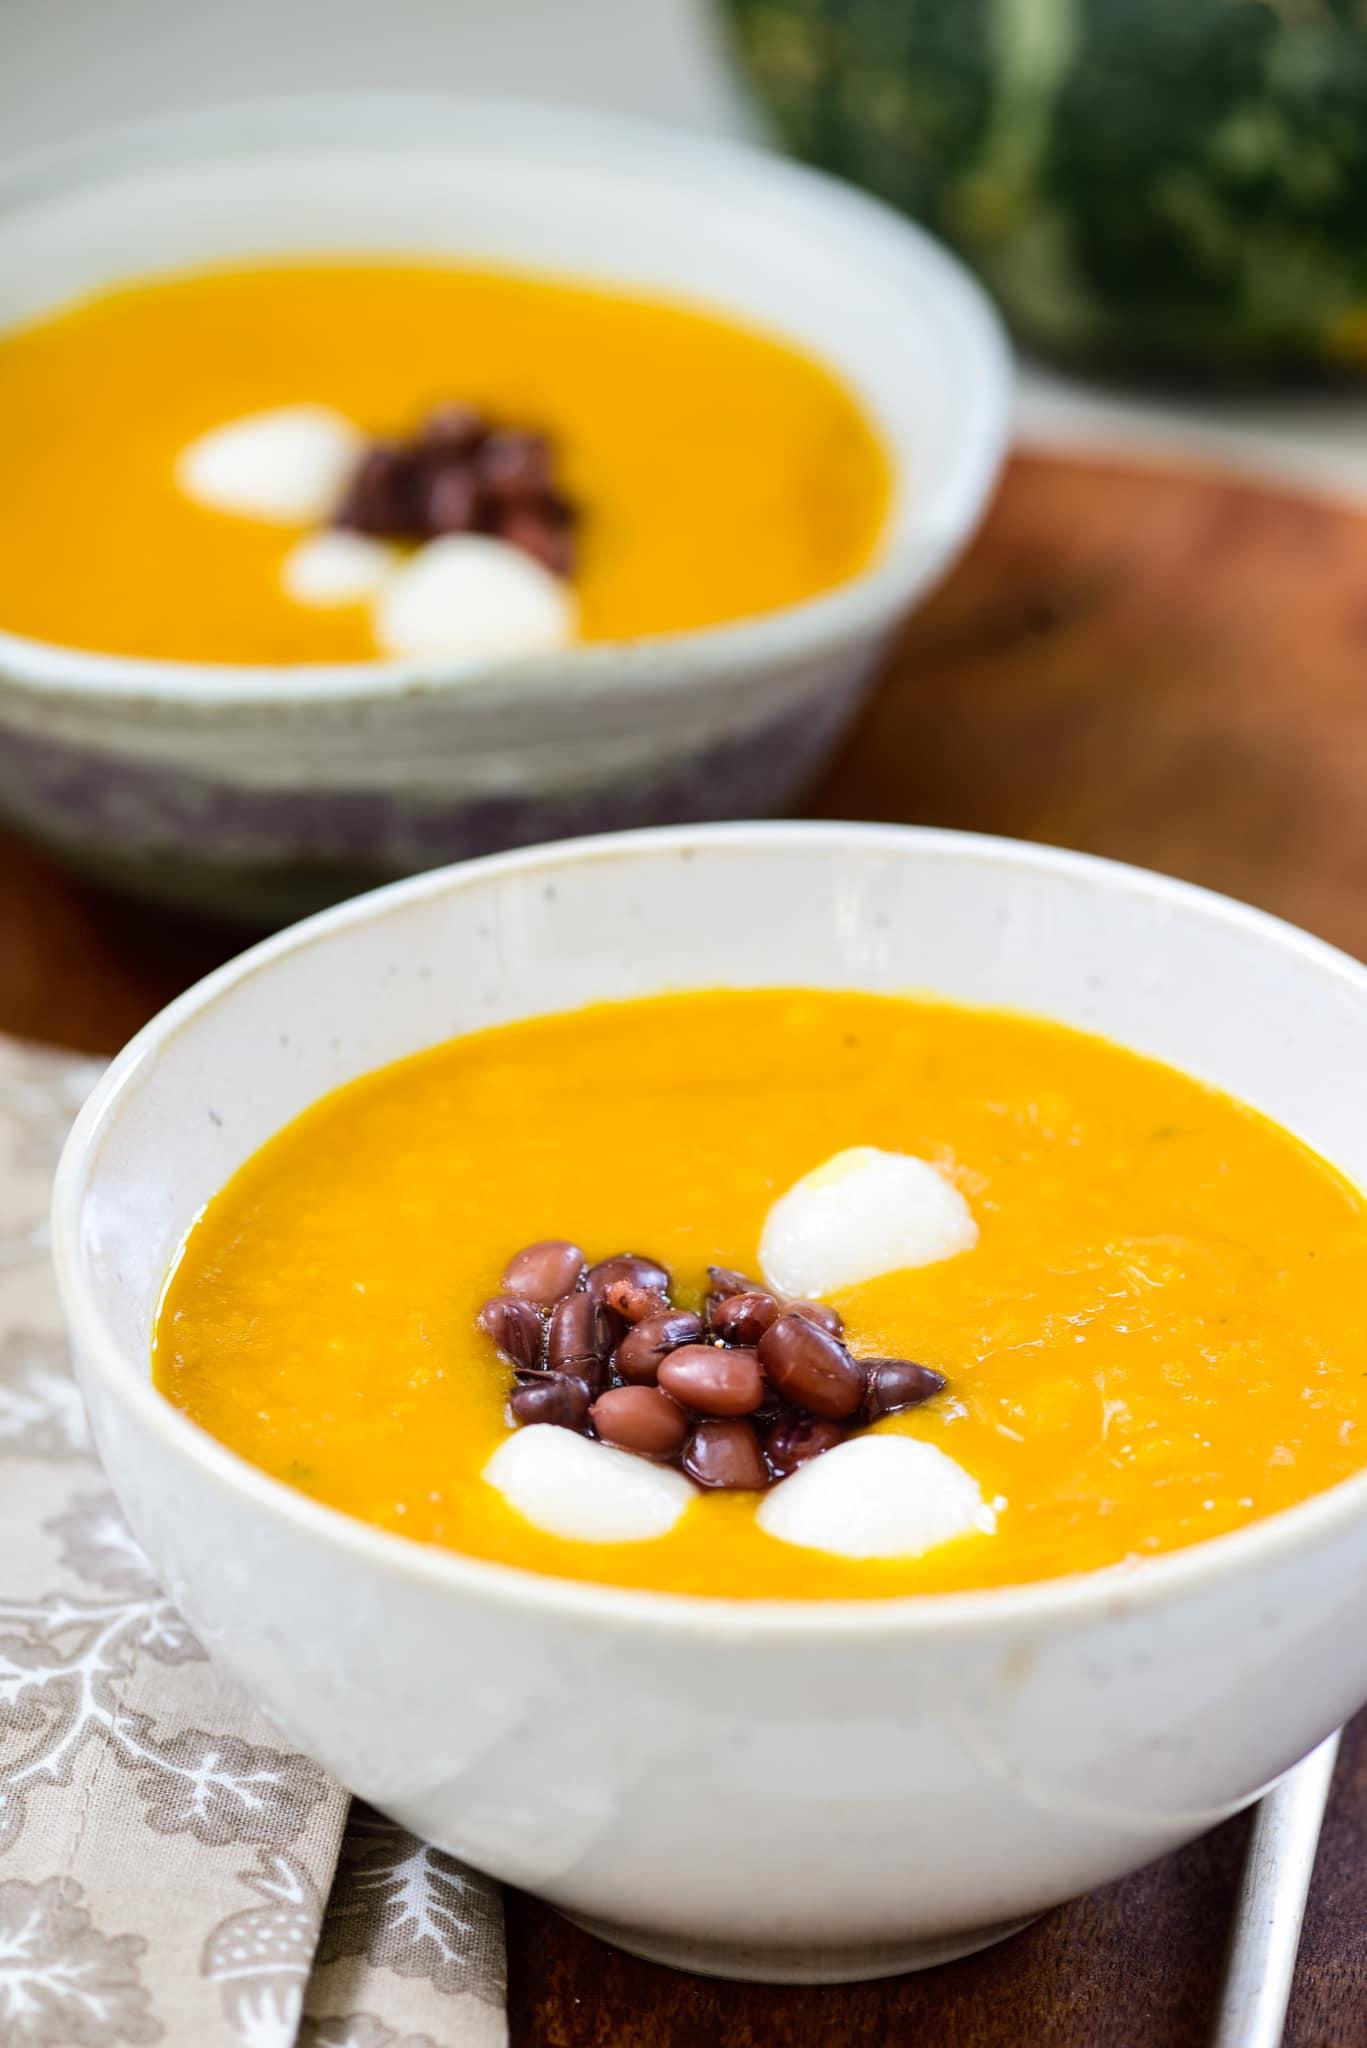 DSC4519 - Hobakjuk (Pumpkin Porridge)